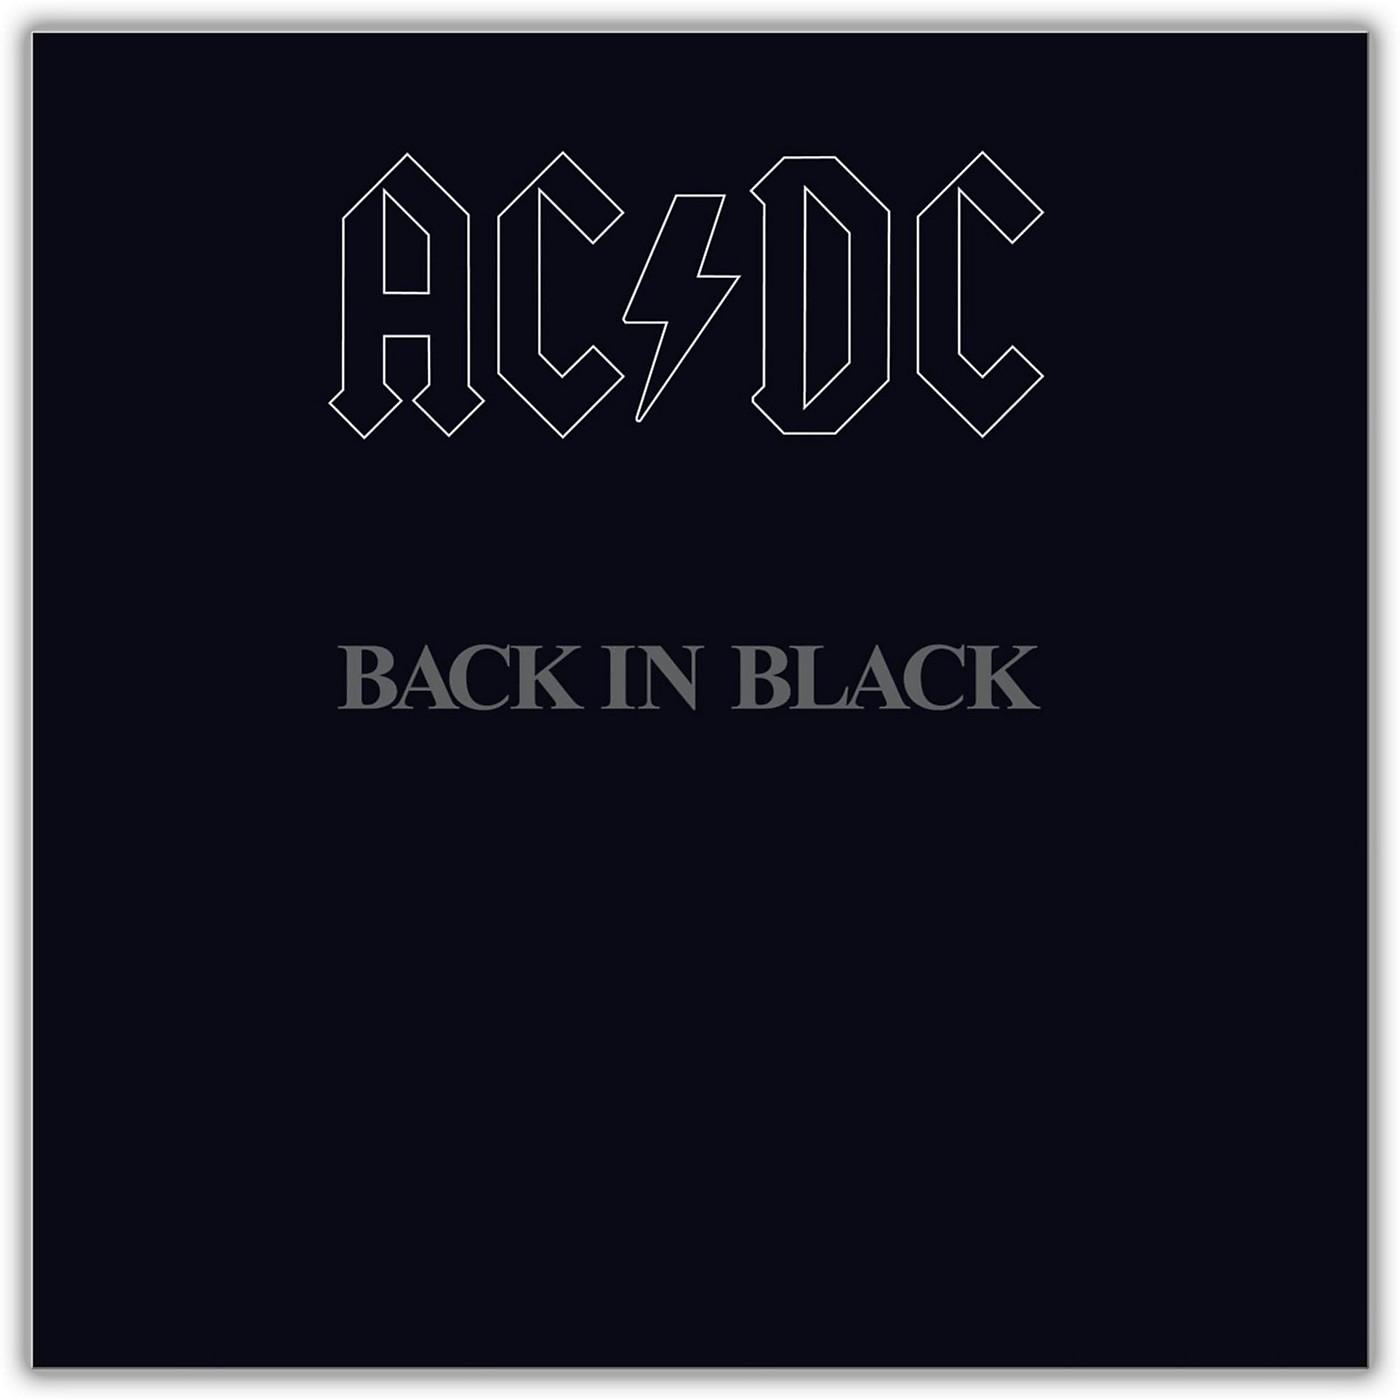 Sony AC/DC - Back in Black Vinyl LP thumbnail